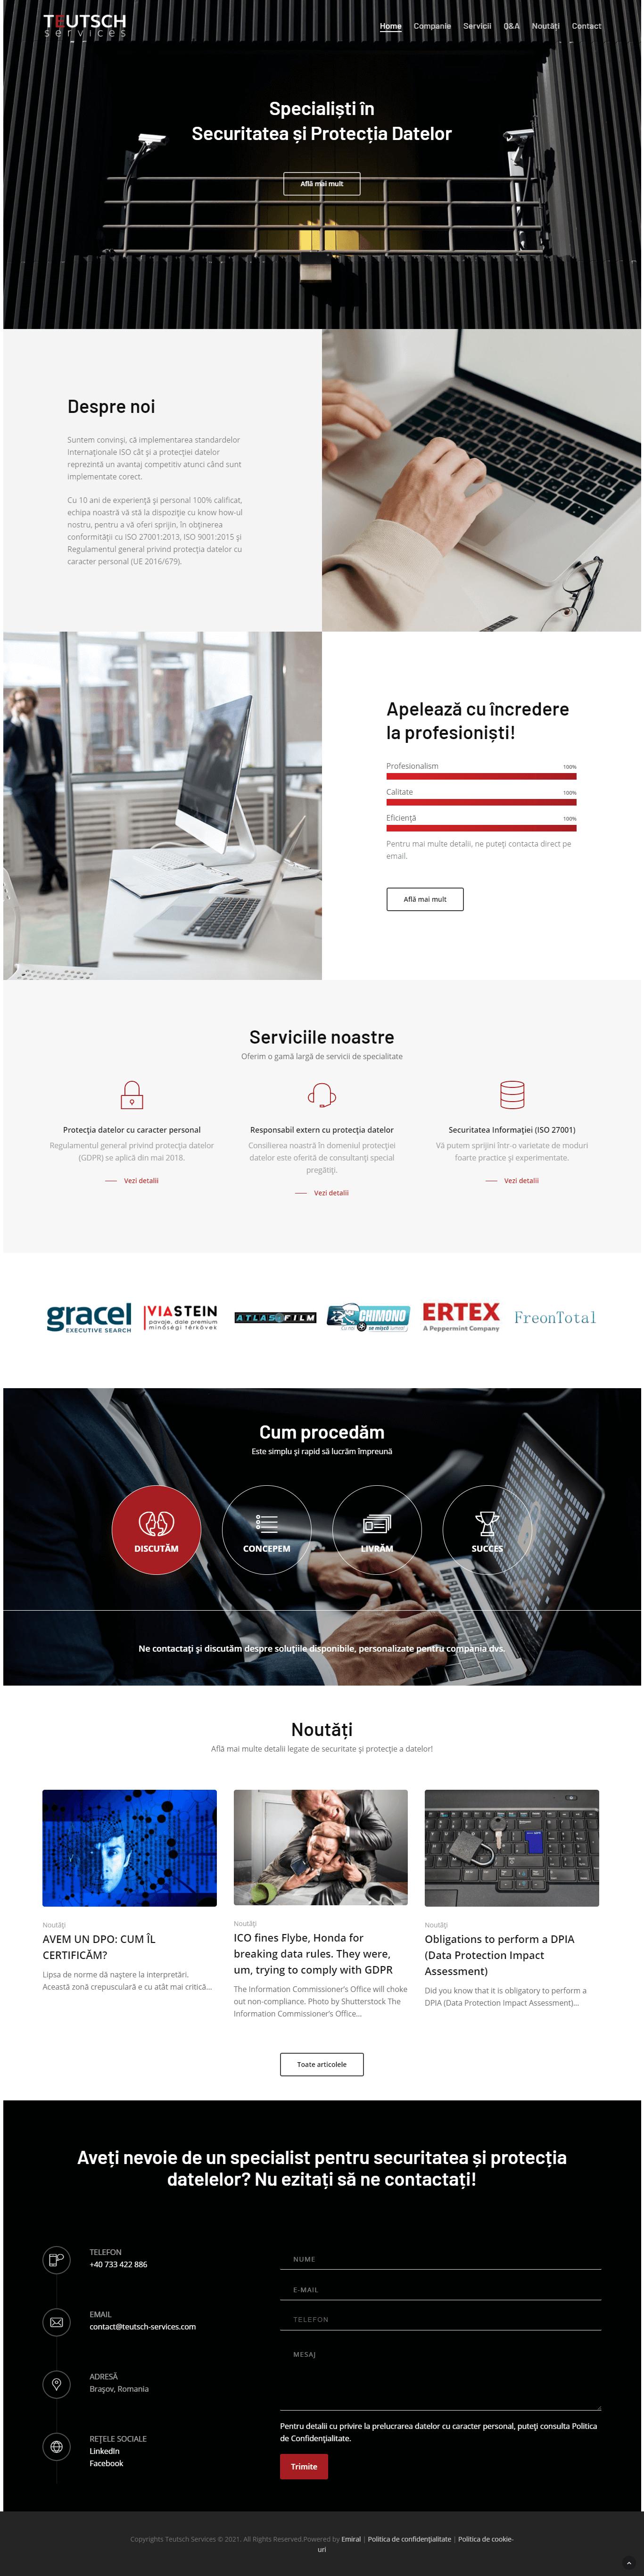 Website Teutsch Services